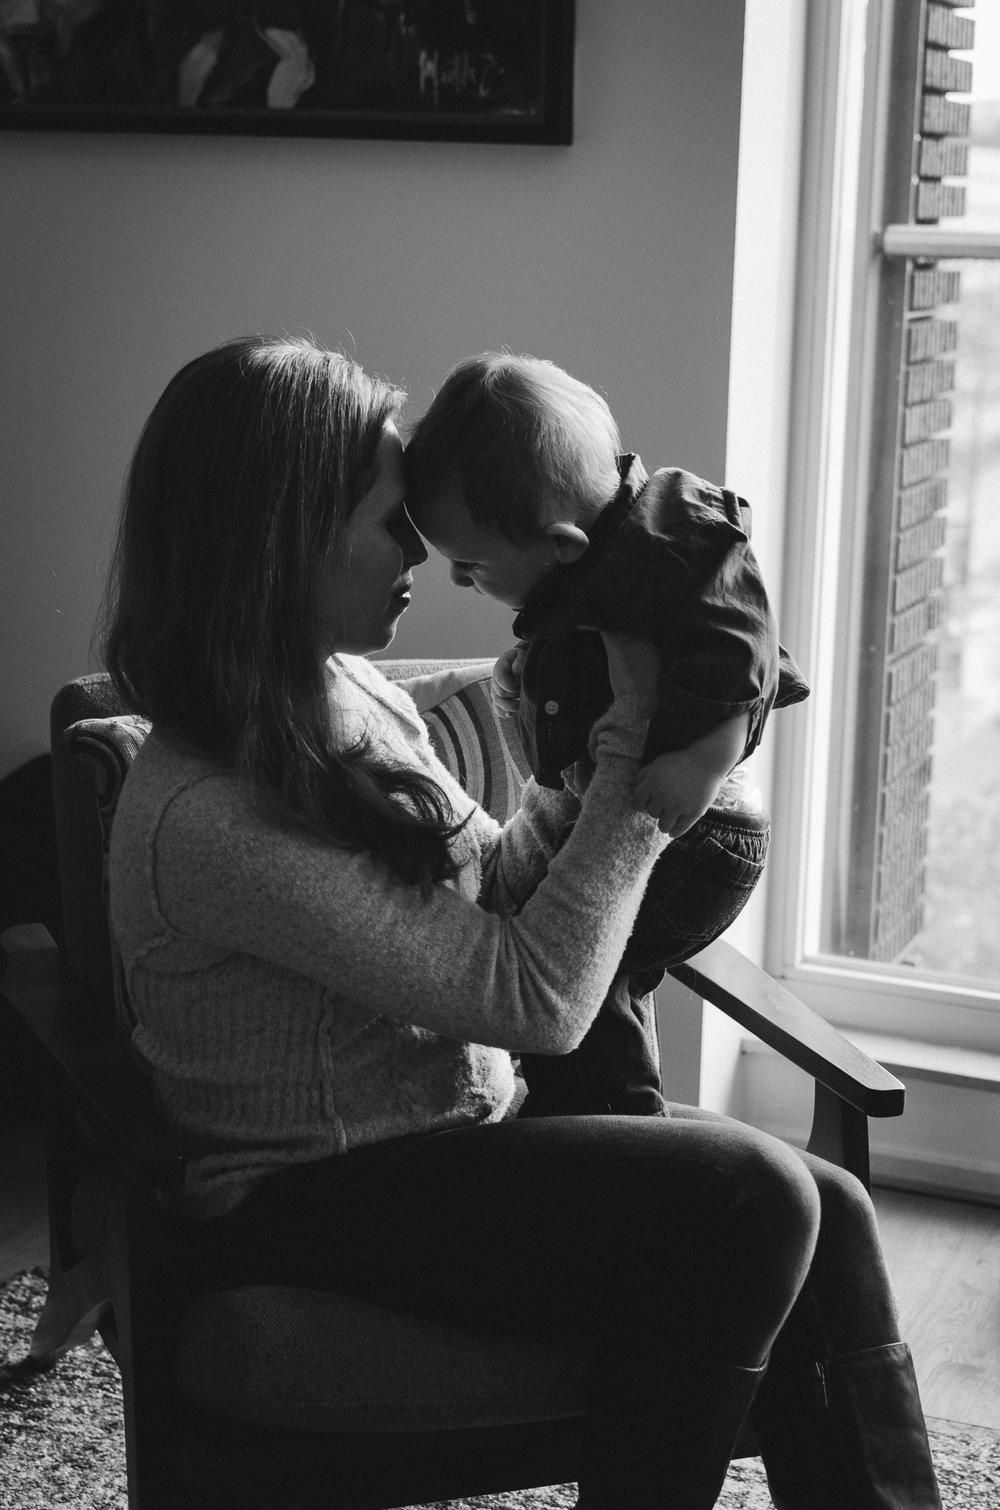 Vicky_McLachlan_Photography_Family_Newborn_Lifestyle_Photographer-1-3-1.jpg